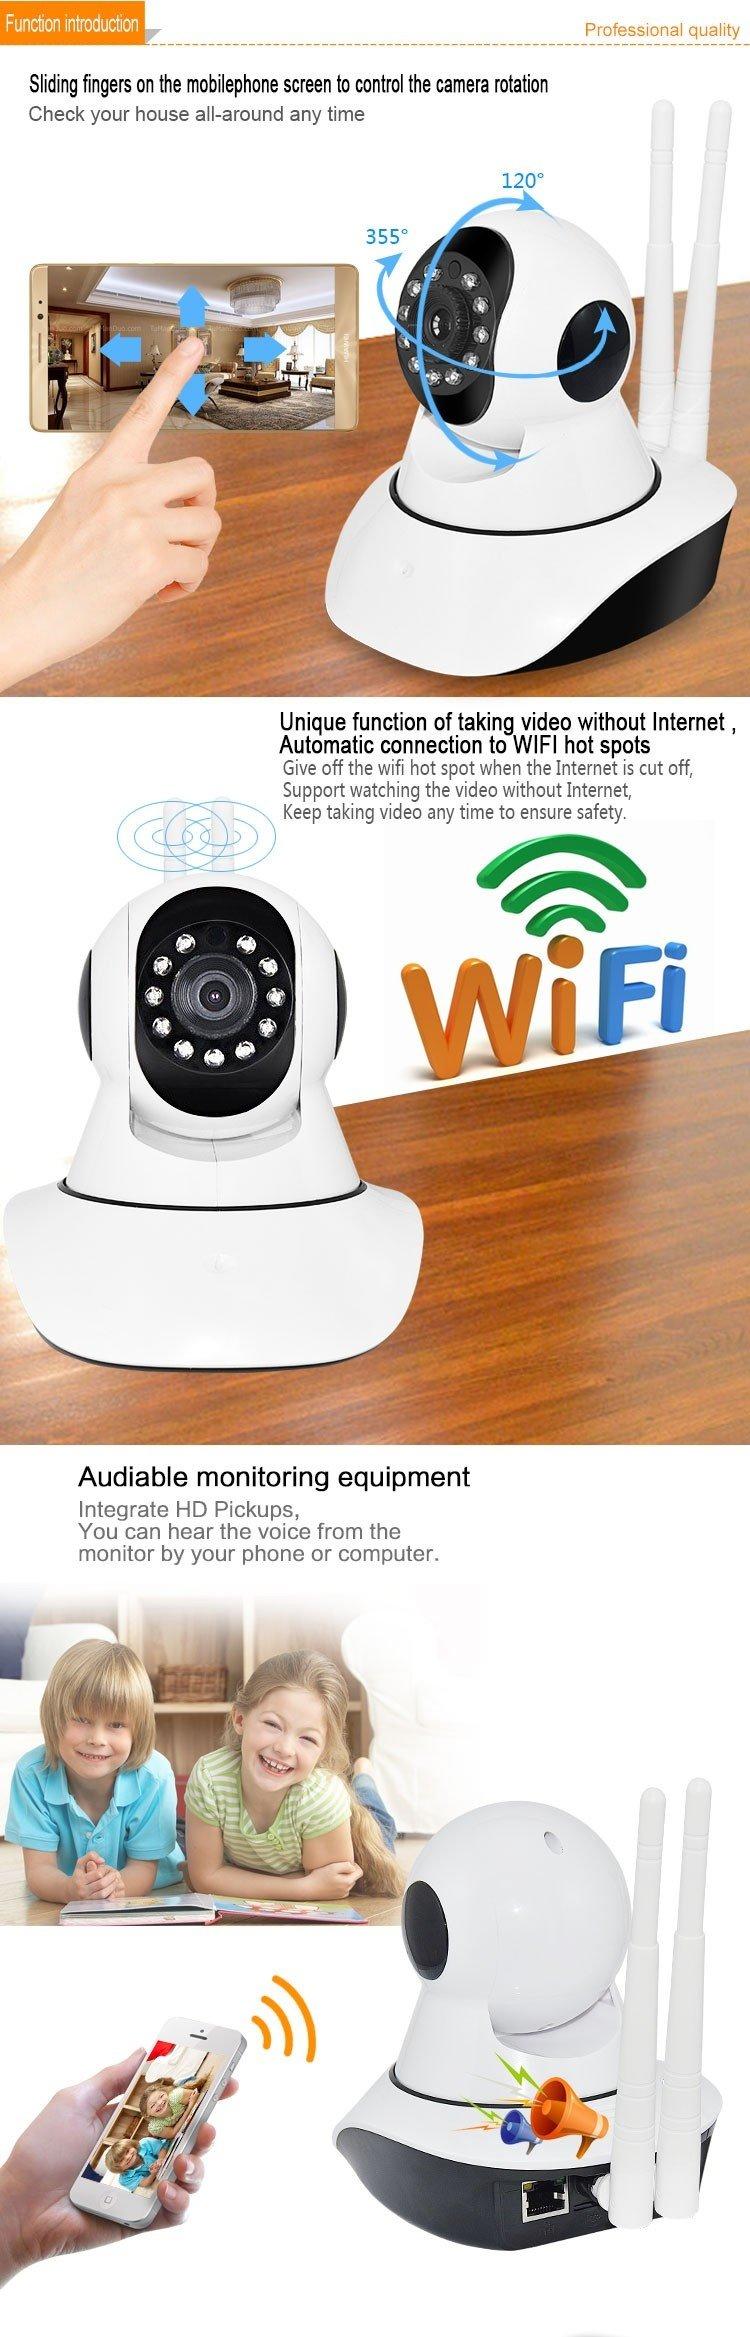 Applink Onvif Yoosee Yy2p App X5 2 Dual Antenna Smart Home Cctv Wifi Ip Camera Hd 720p With 2016 Hot Selling Indoor Security Network Ir